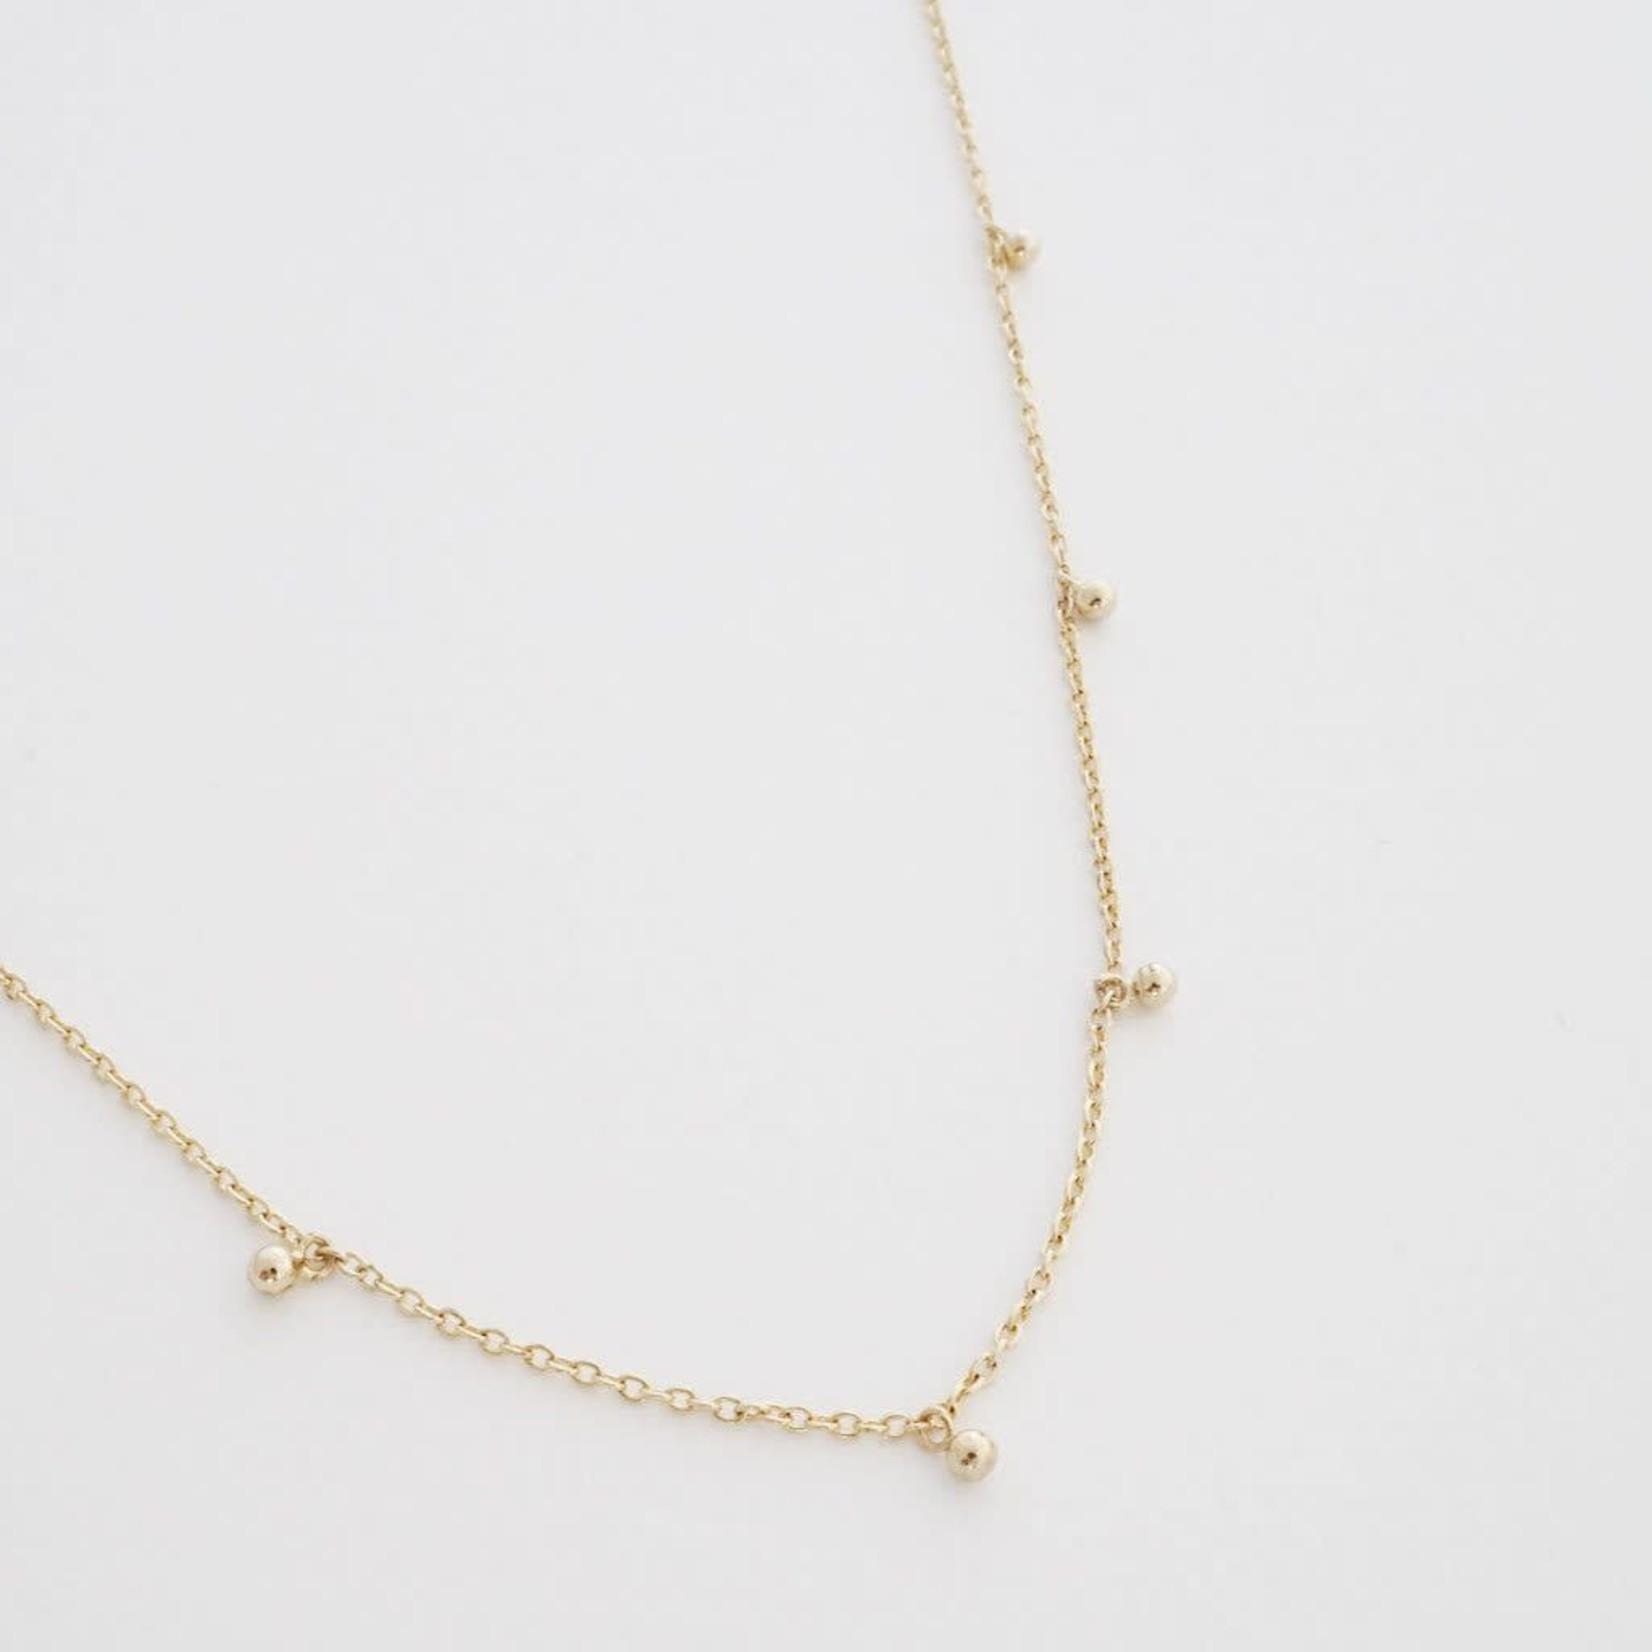 Honeycat Jewelry Honeycat Anna Charm Necklace